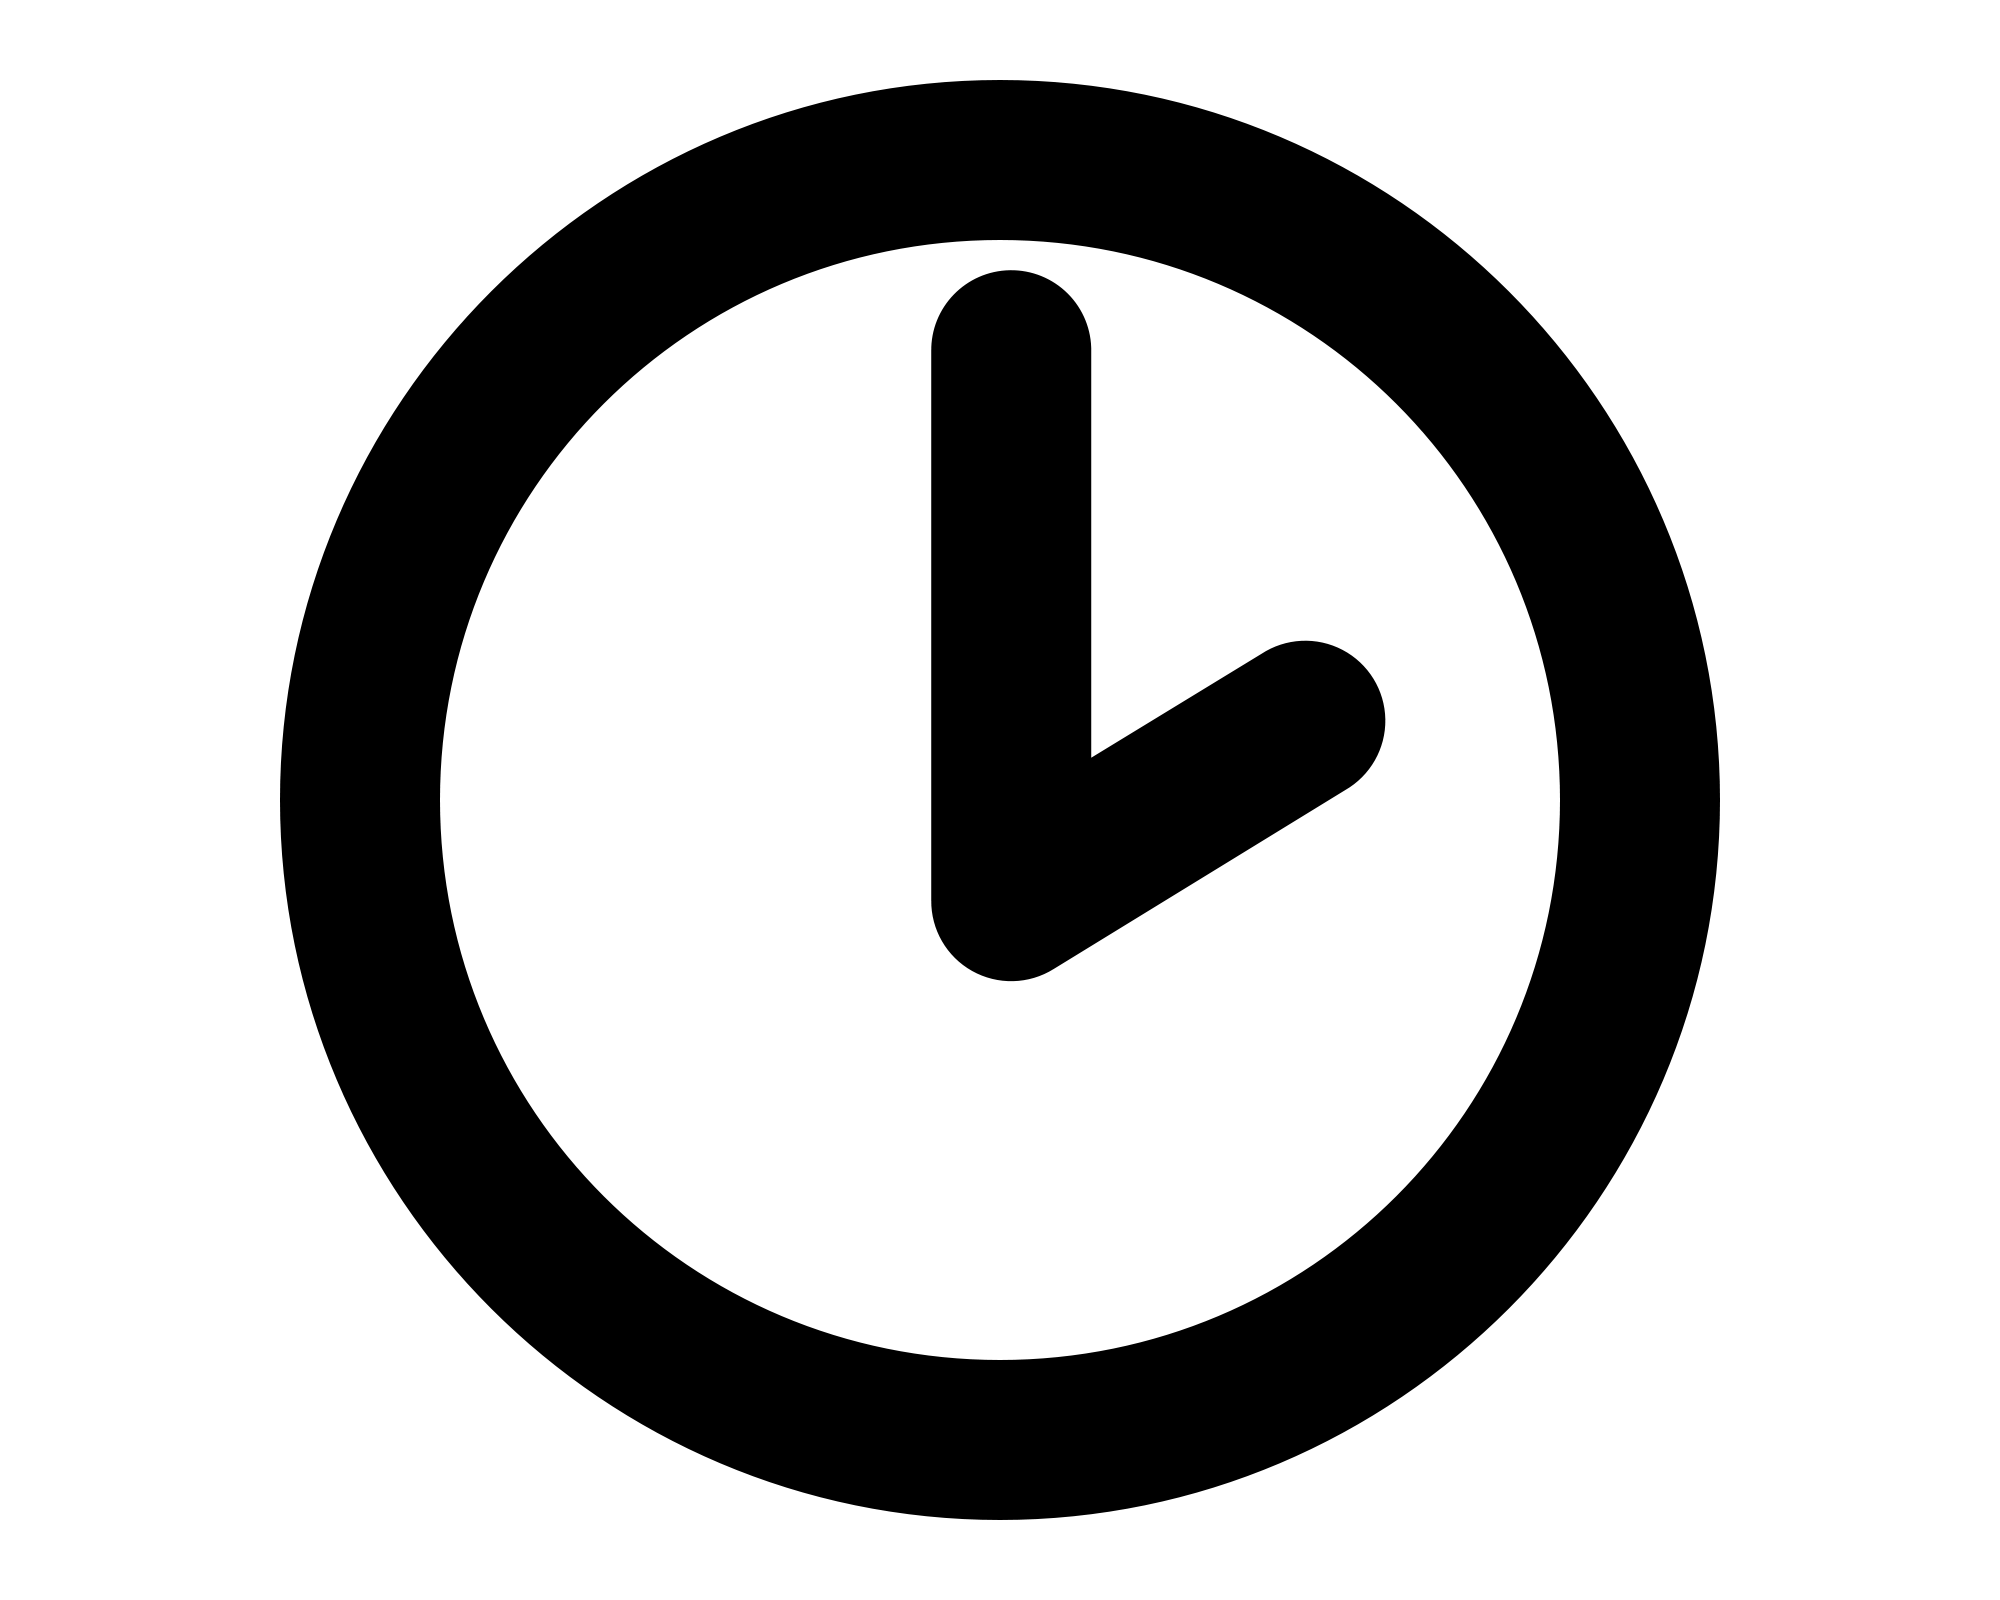 image transparent stock icon transparent time #98077062